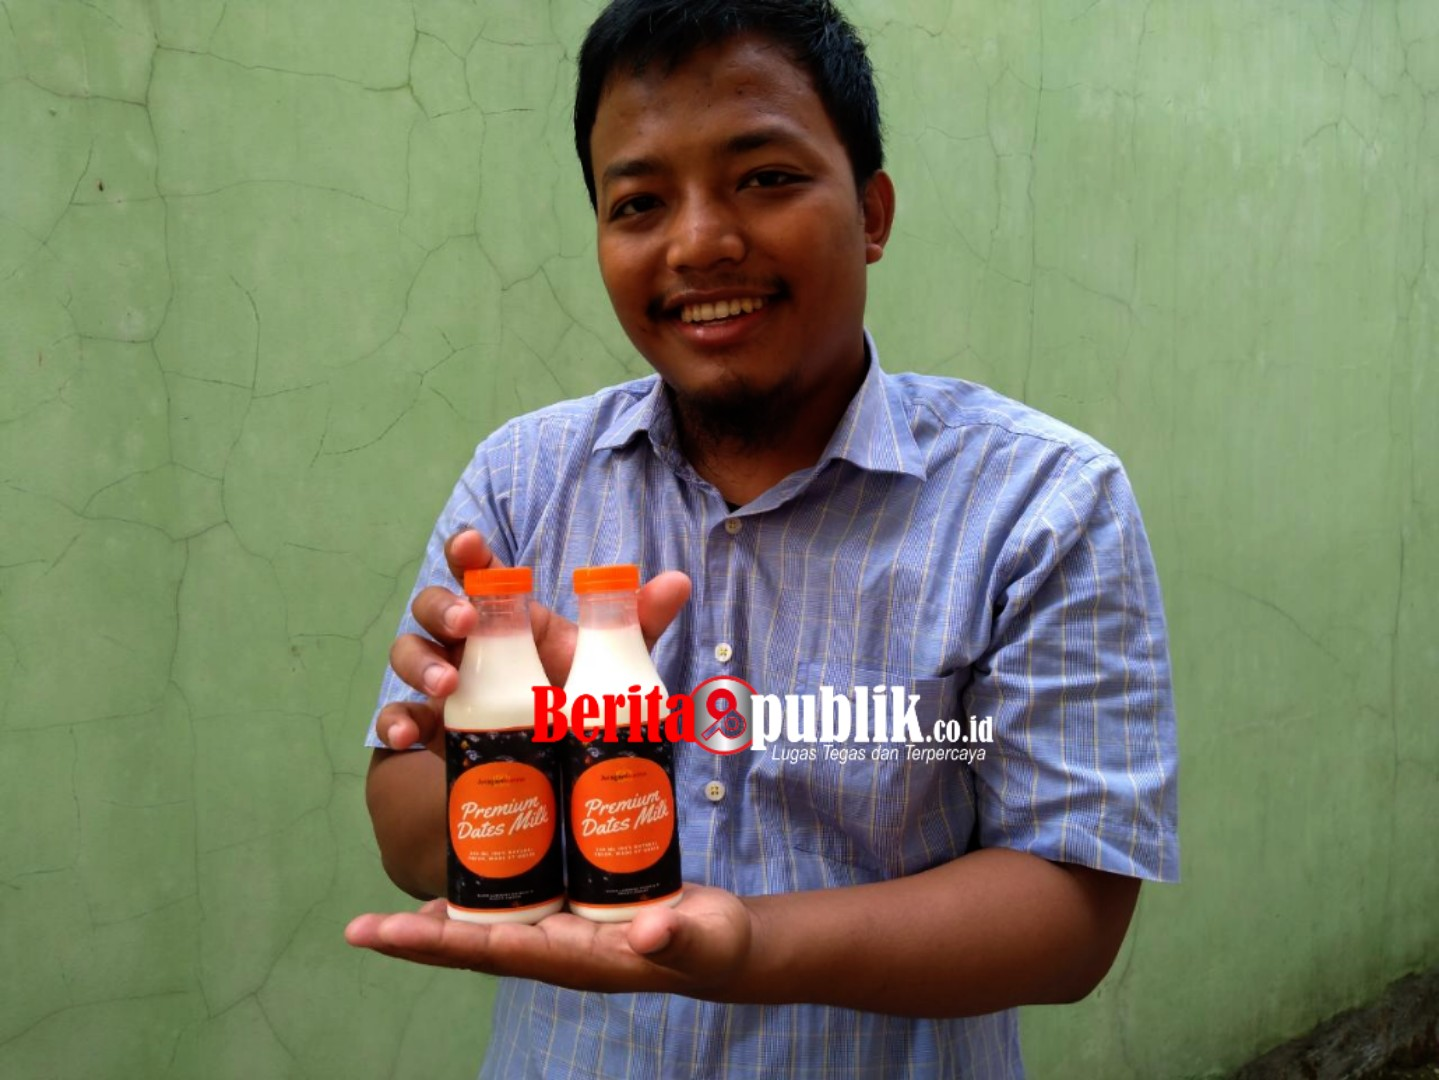 Owner Juragankurma, Gilang Muhammad